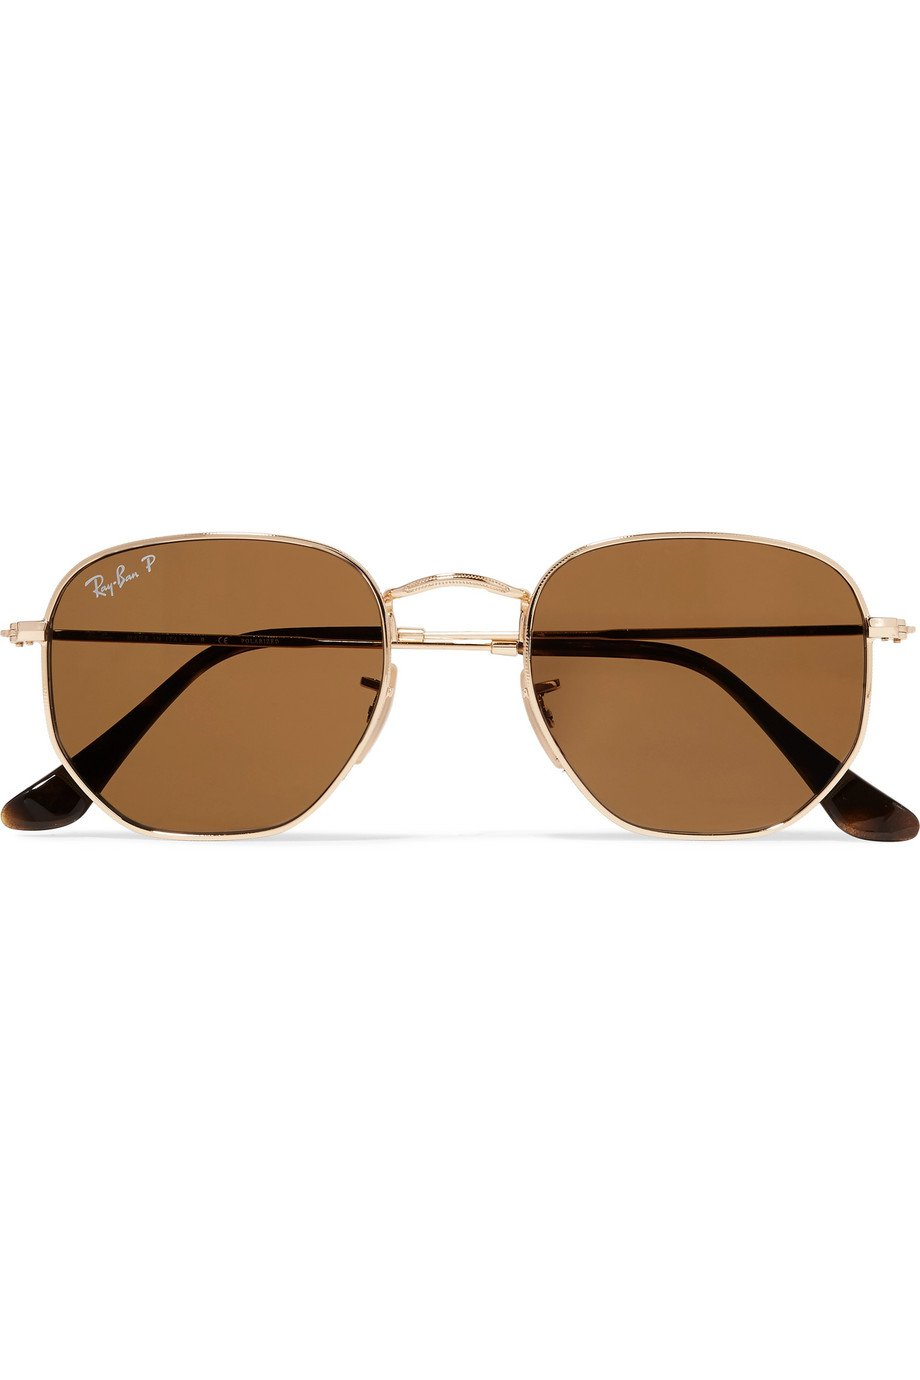 Ray-Ban | Hexagon-frame polarized gold-tone sunglasses | NET-A-PORTER.COM